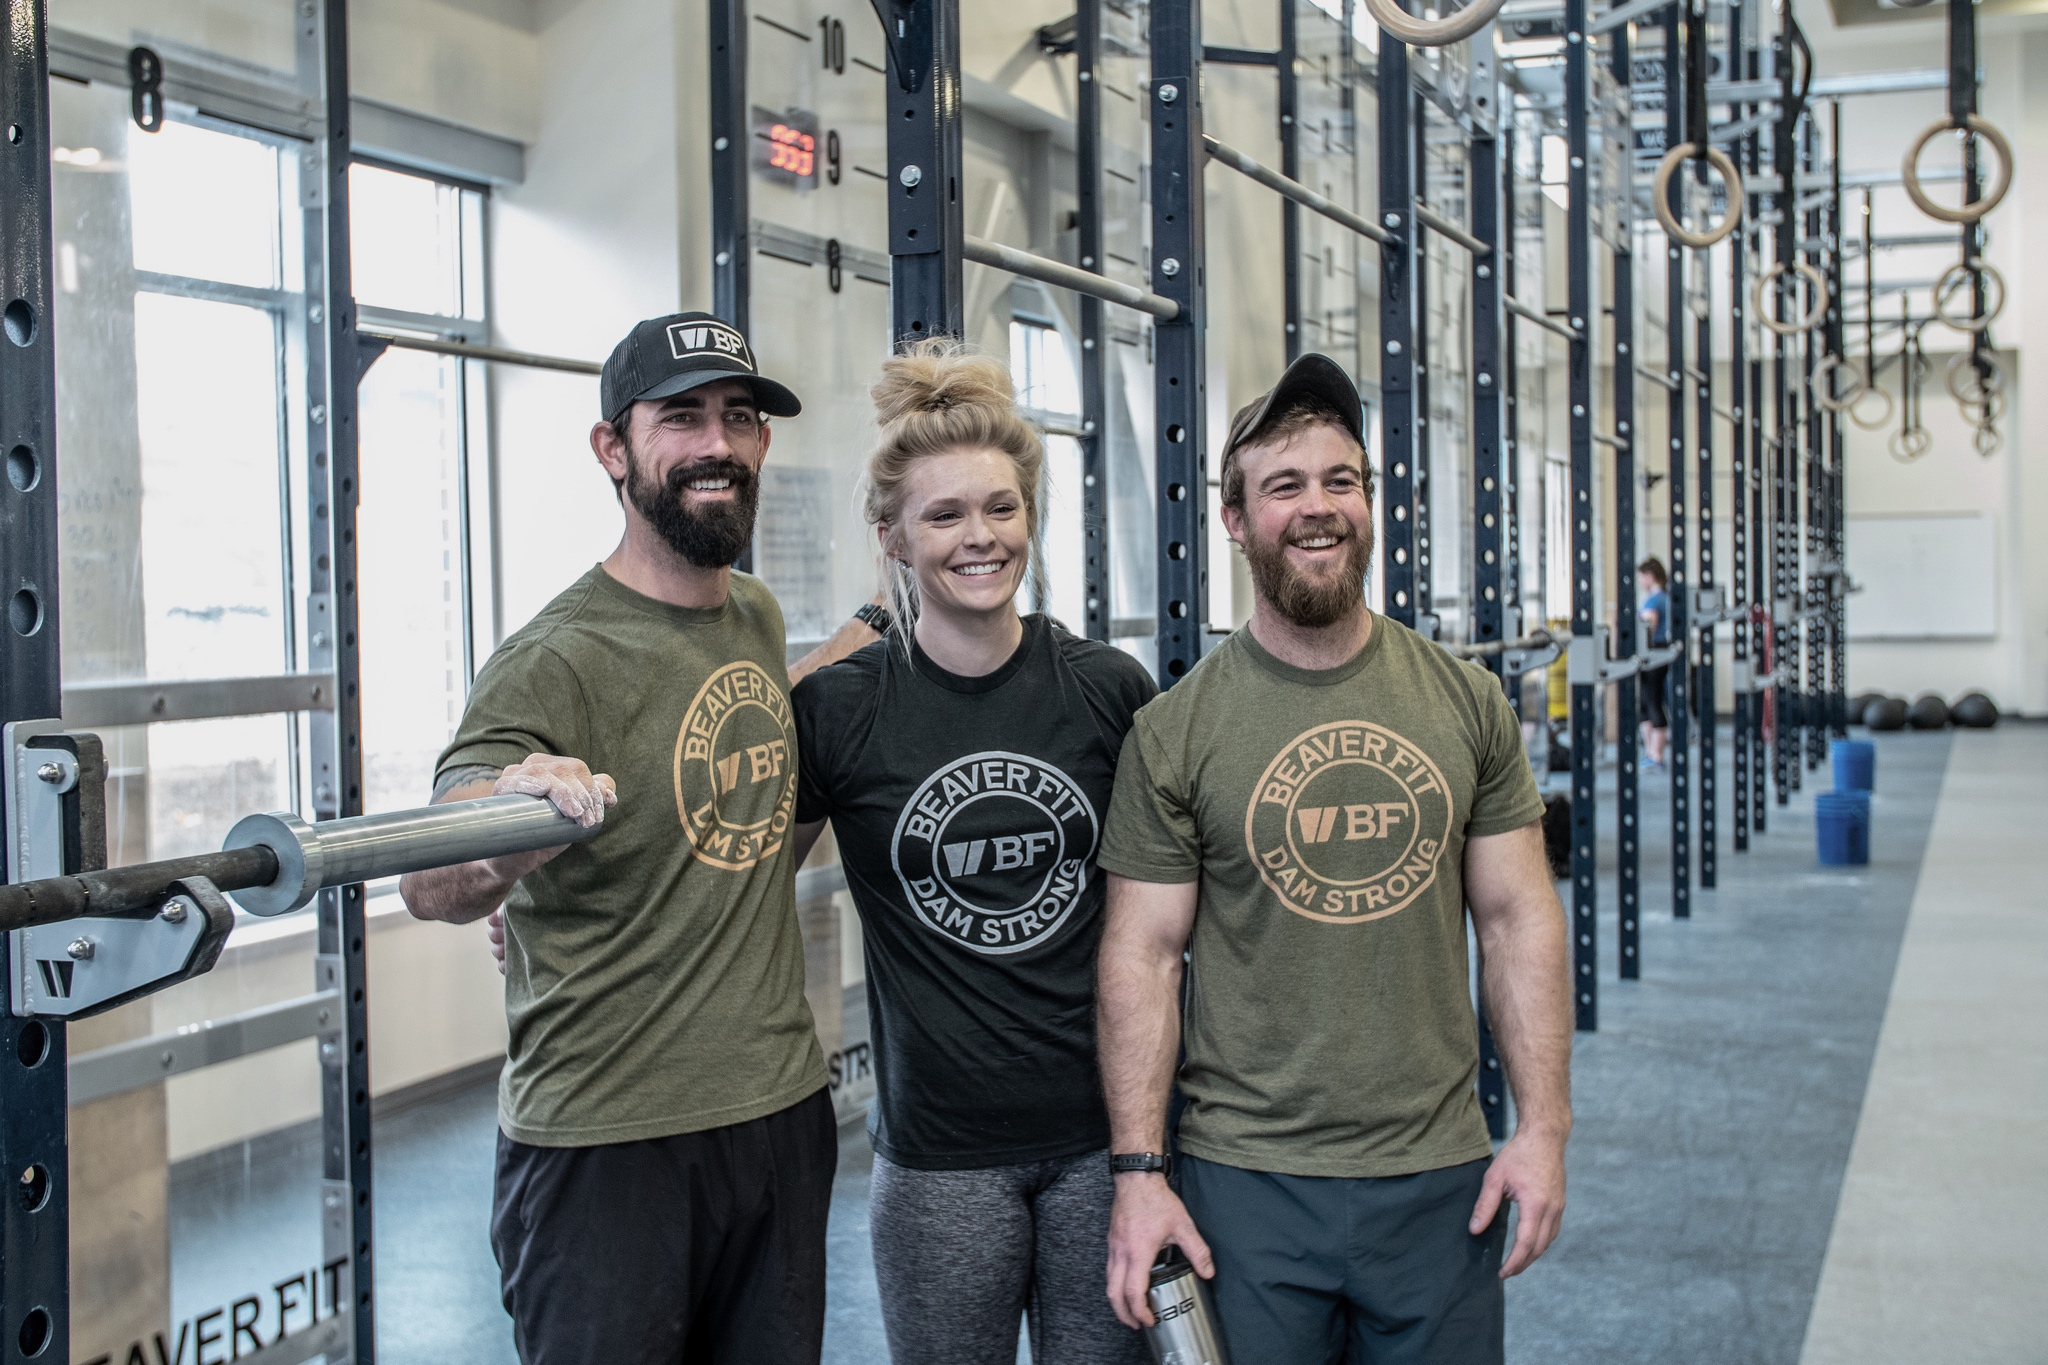 Team members at The University of Nevada, Reno